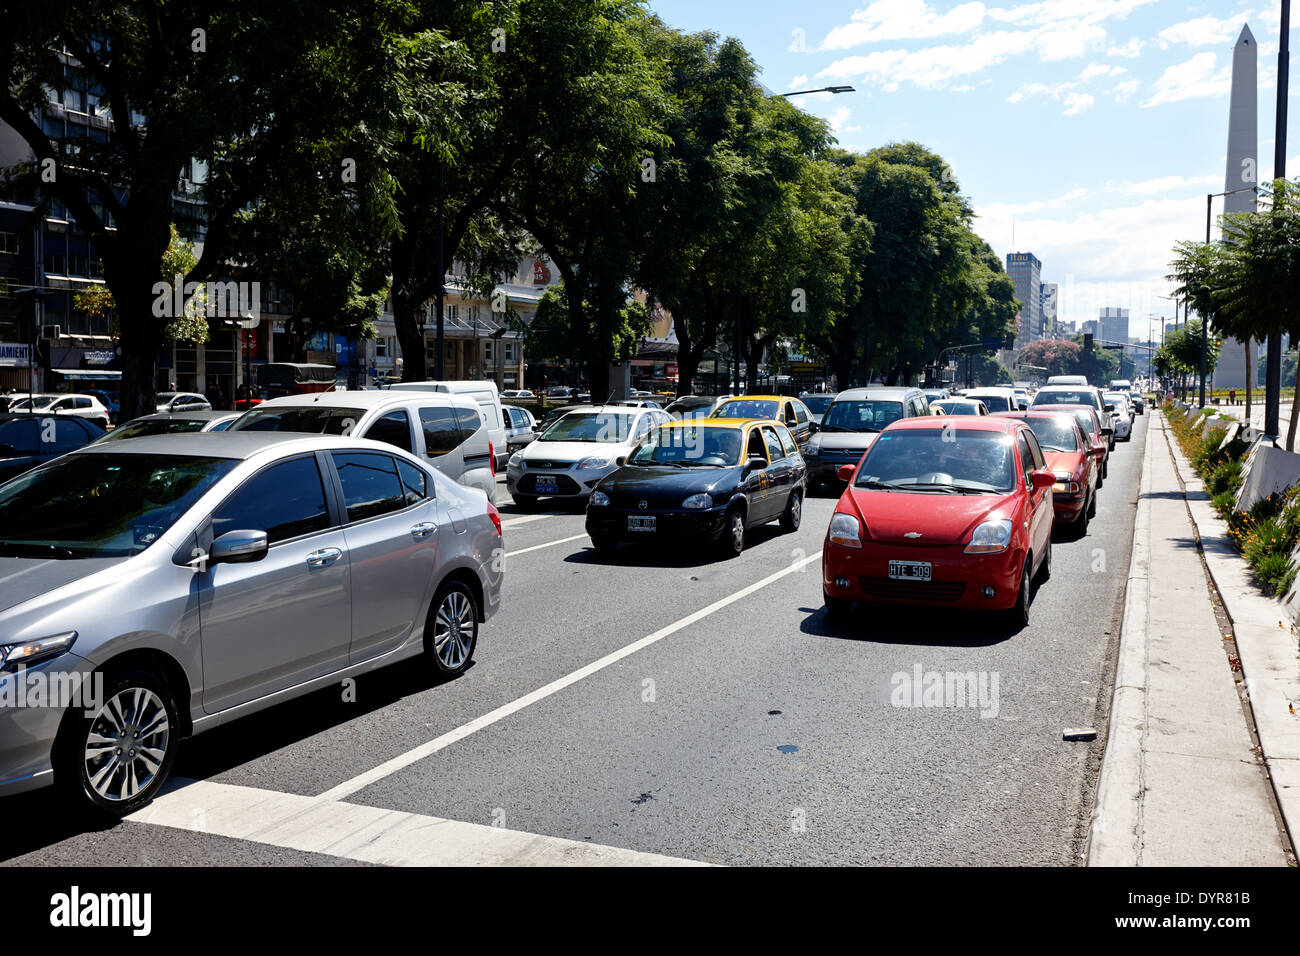 busy traffic on avenida 9 de julio Buenos Aires Argentina - Stock Image